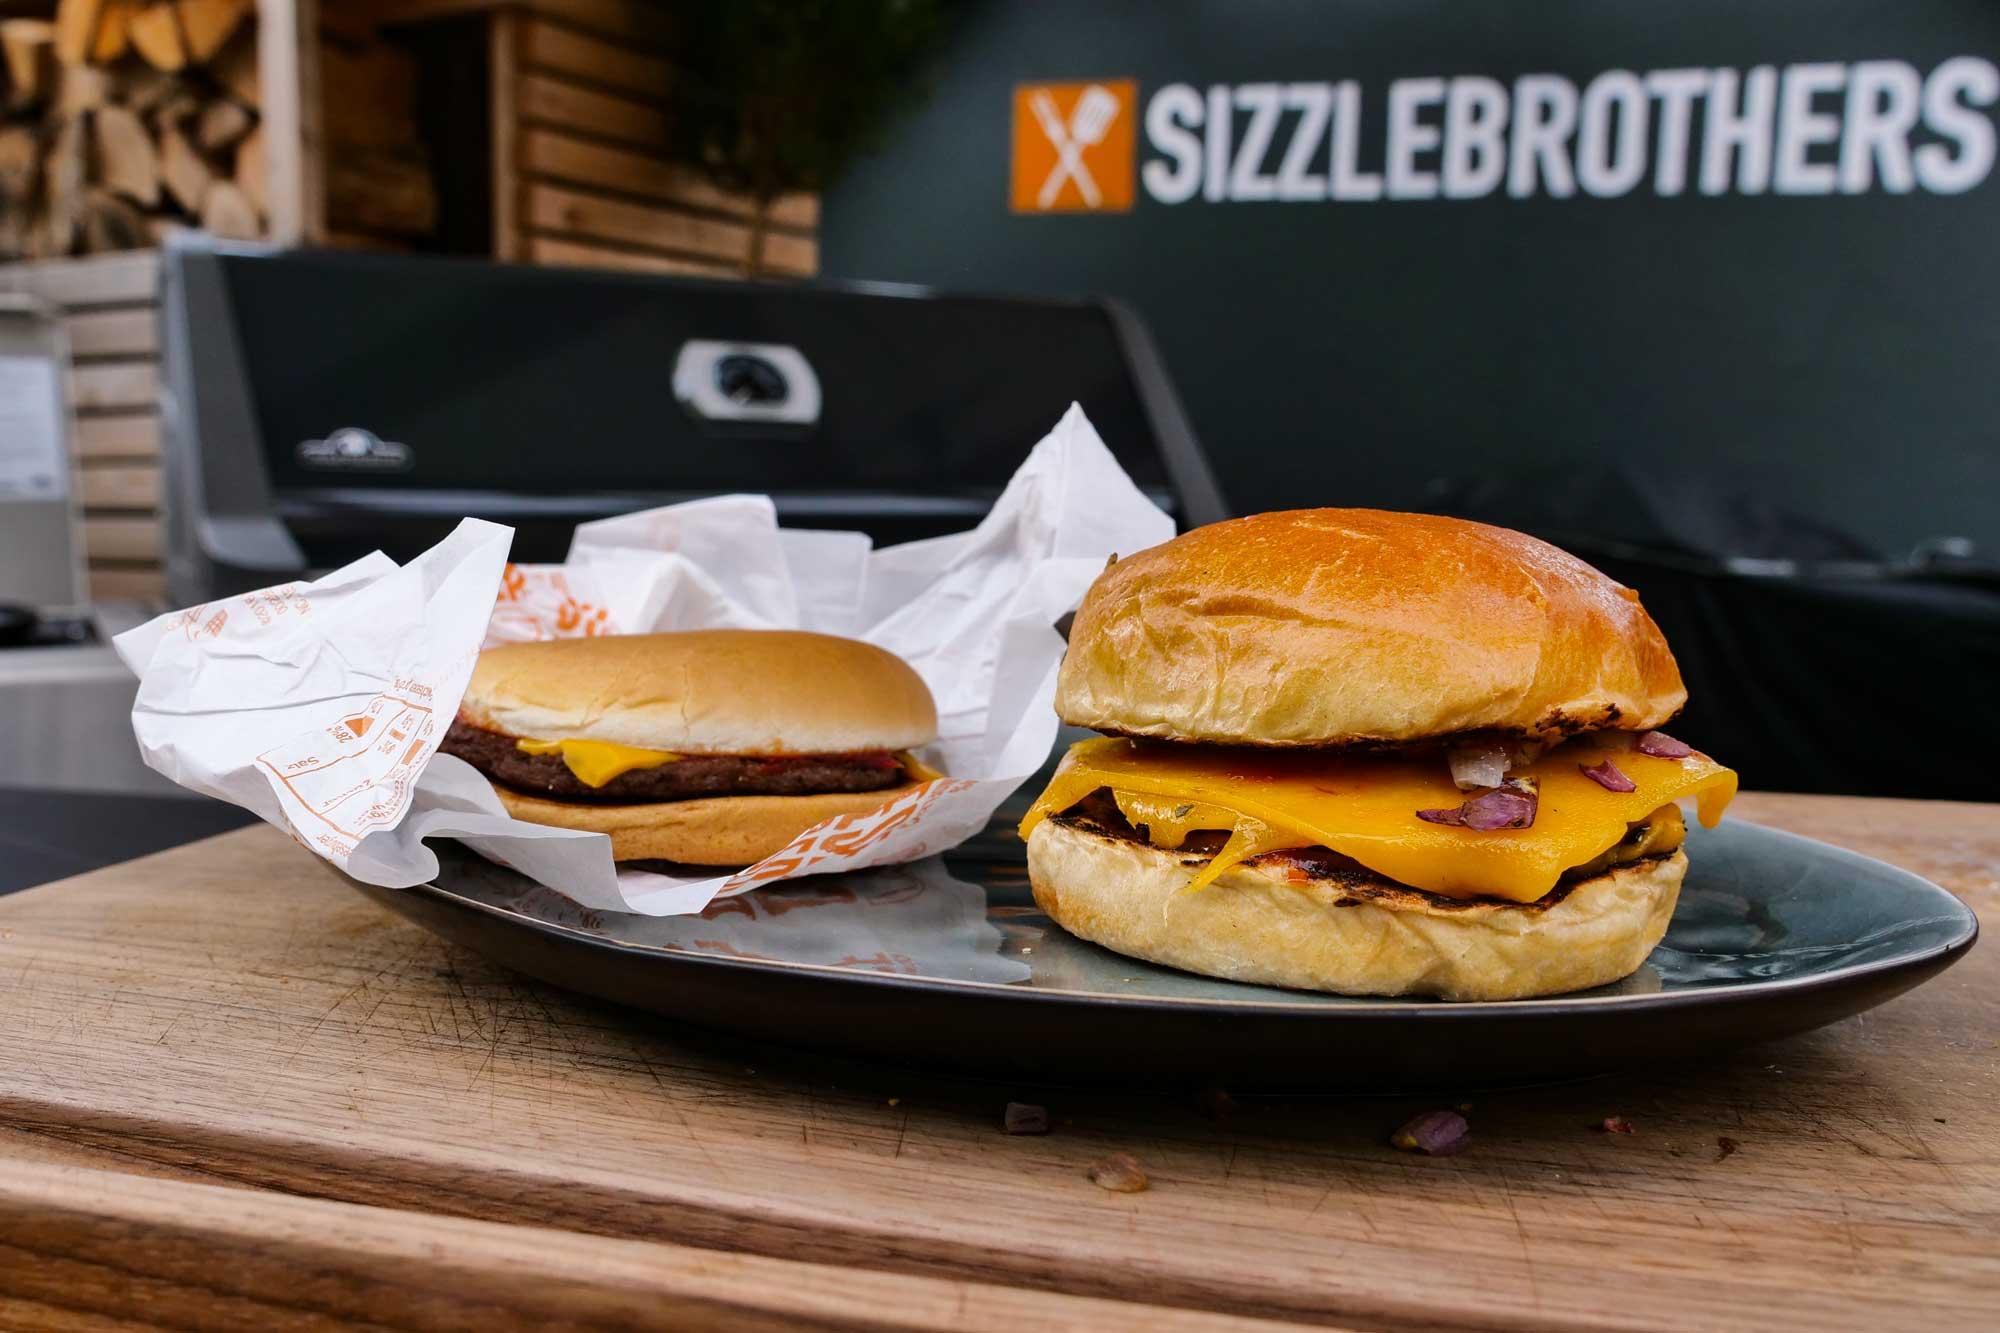 McDonalds Cheeseburger selber machen – so geht's